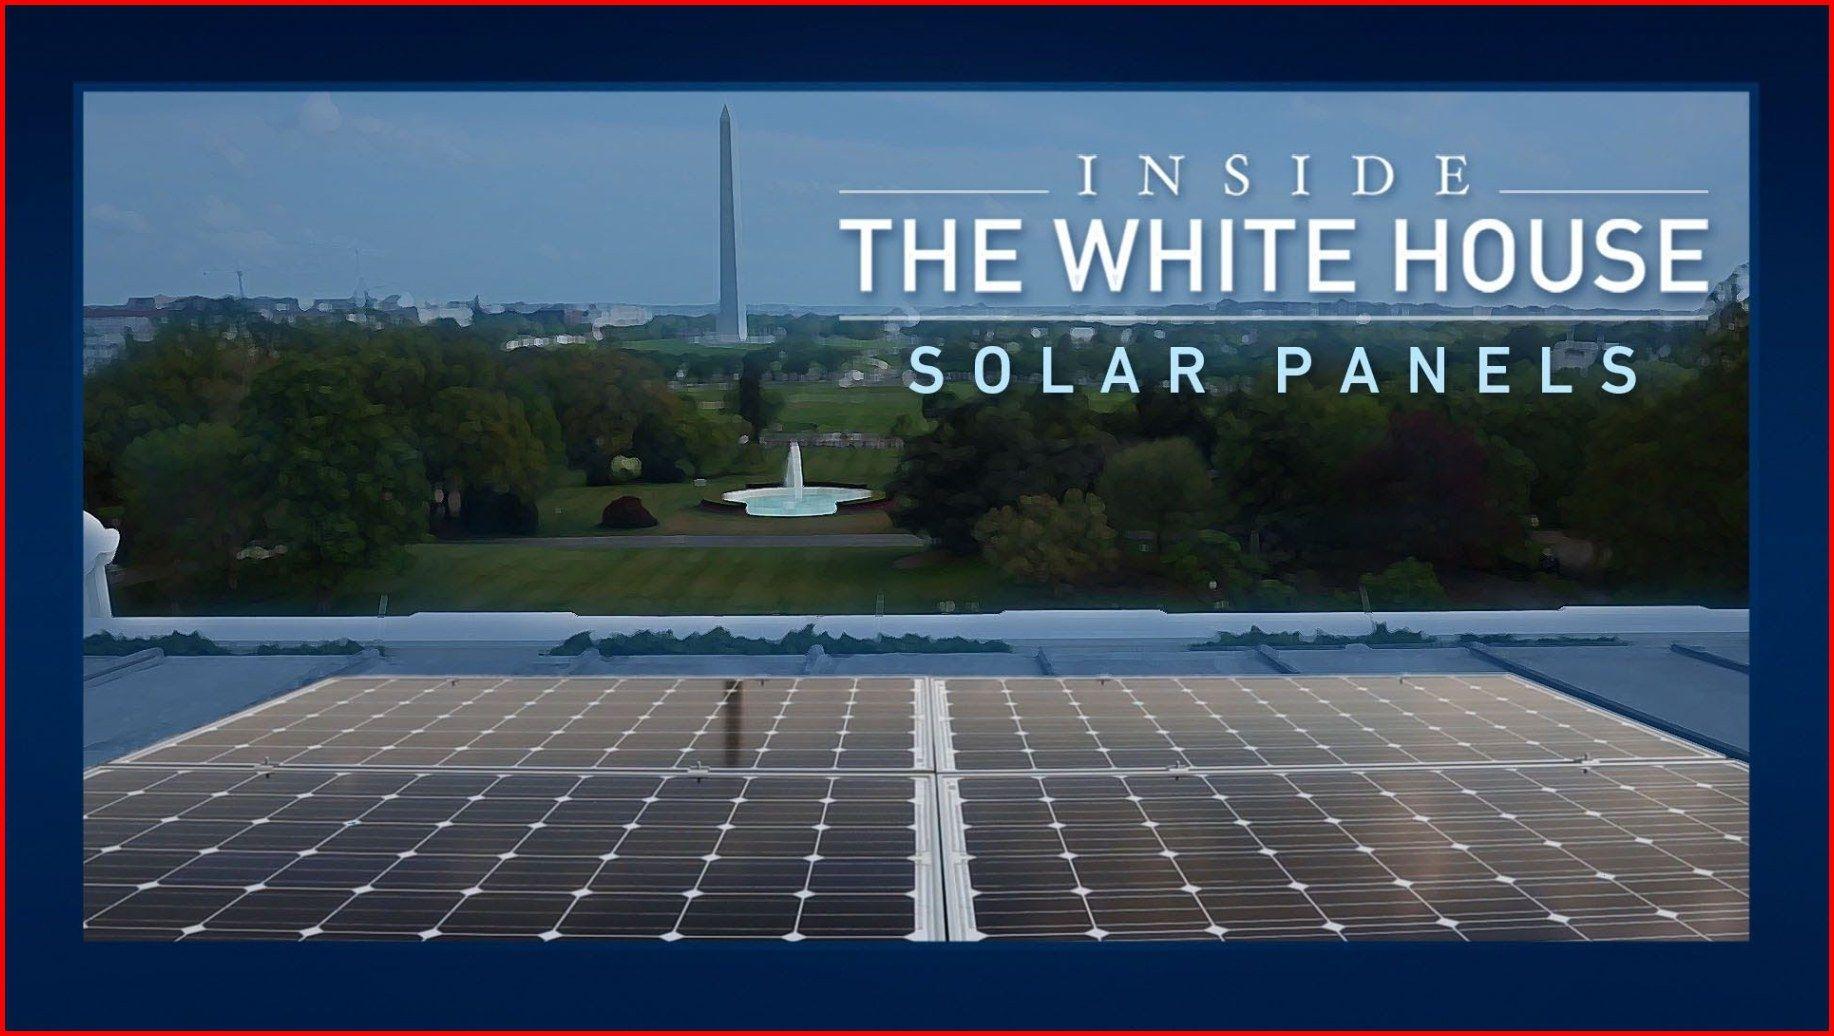 Green Energy Solutions Renewableresource Solar Panels Solar Pool Solar Panels